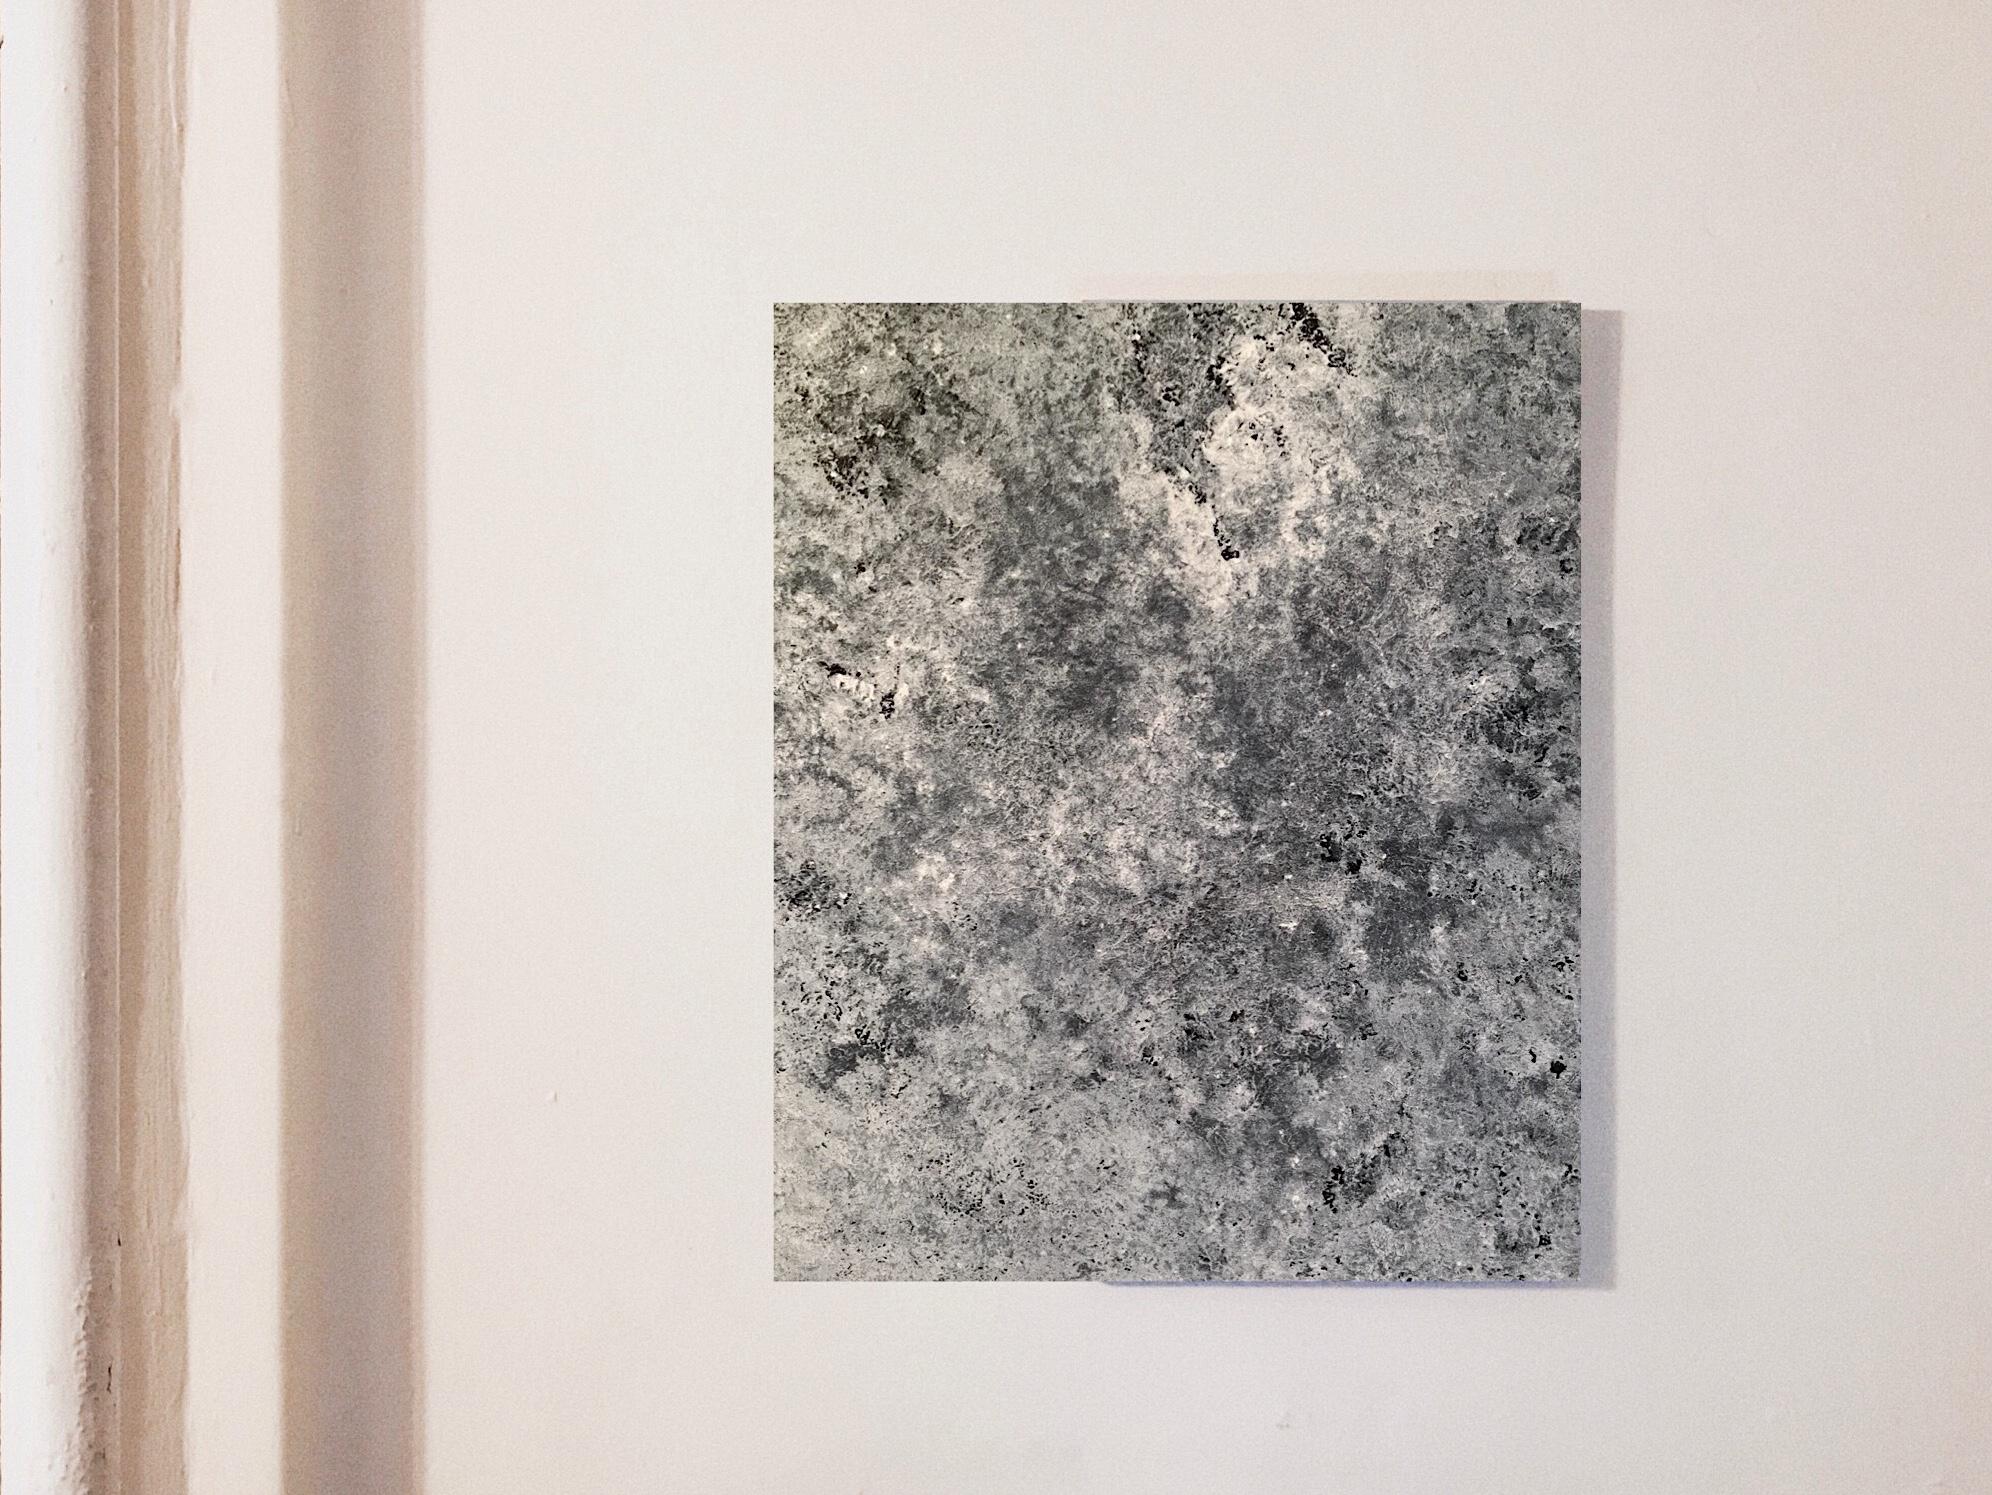 Marine Bonzom - Artiste Peintre Biarritz - Home - Moonshine